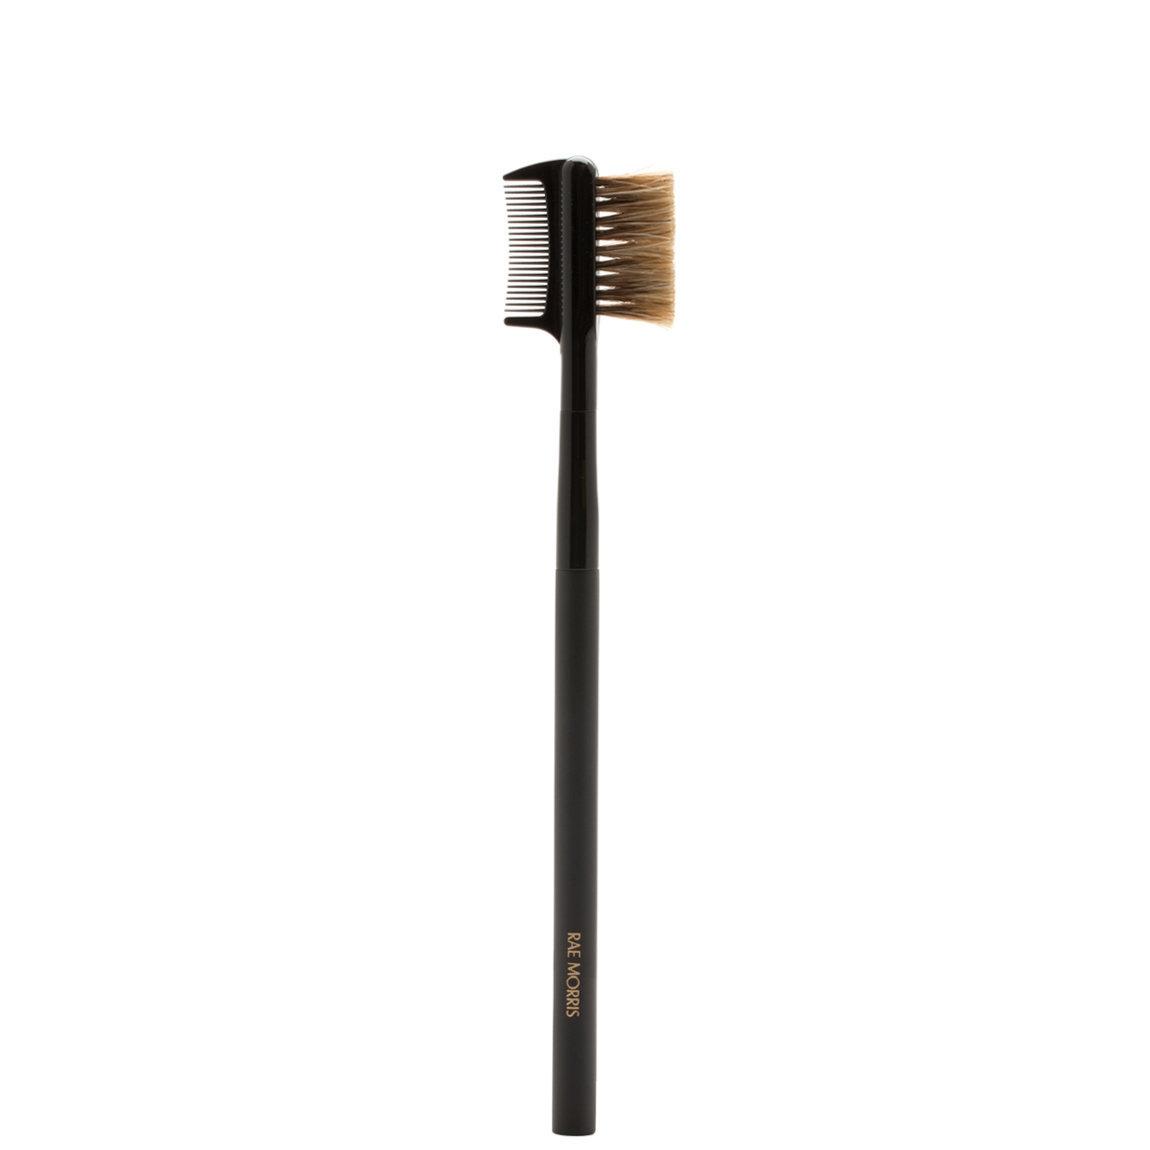 Rae Morris Jishaku Brush 18: Lash Brow Duo product swatch.